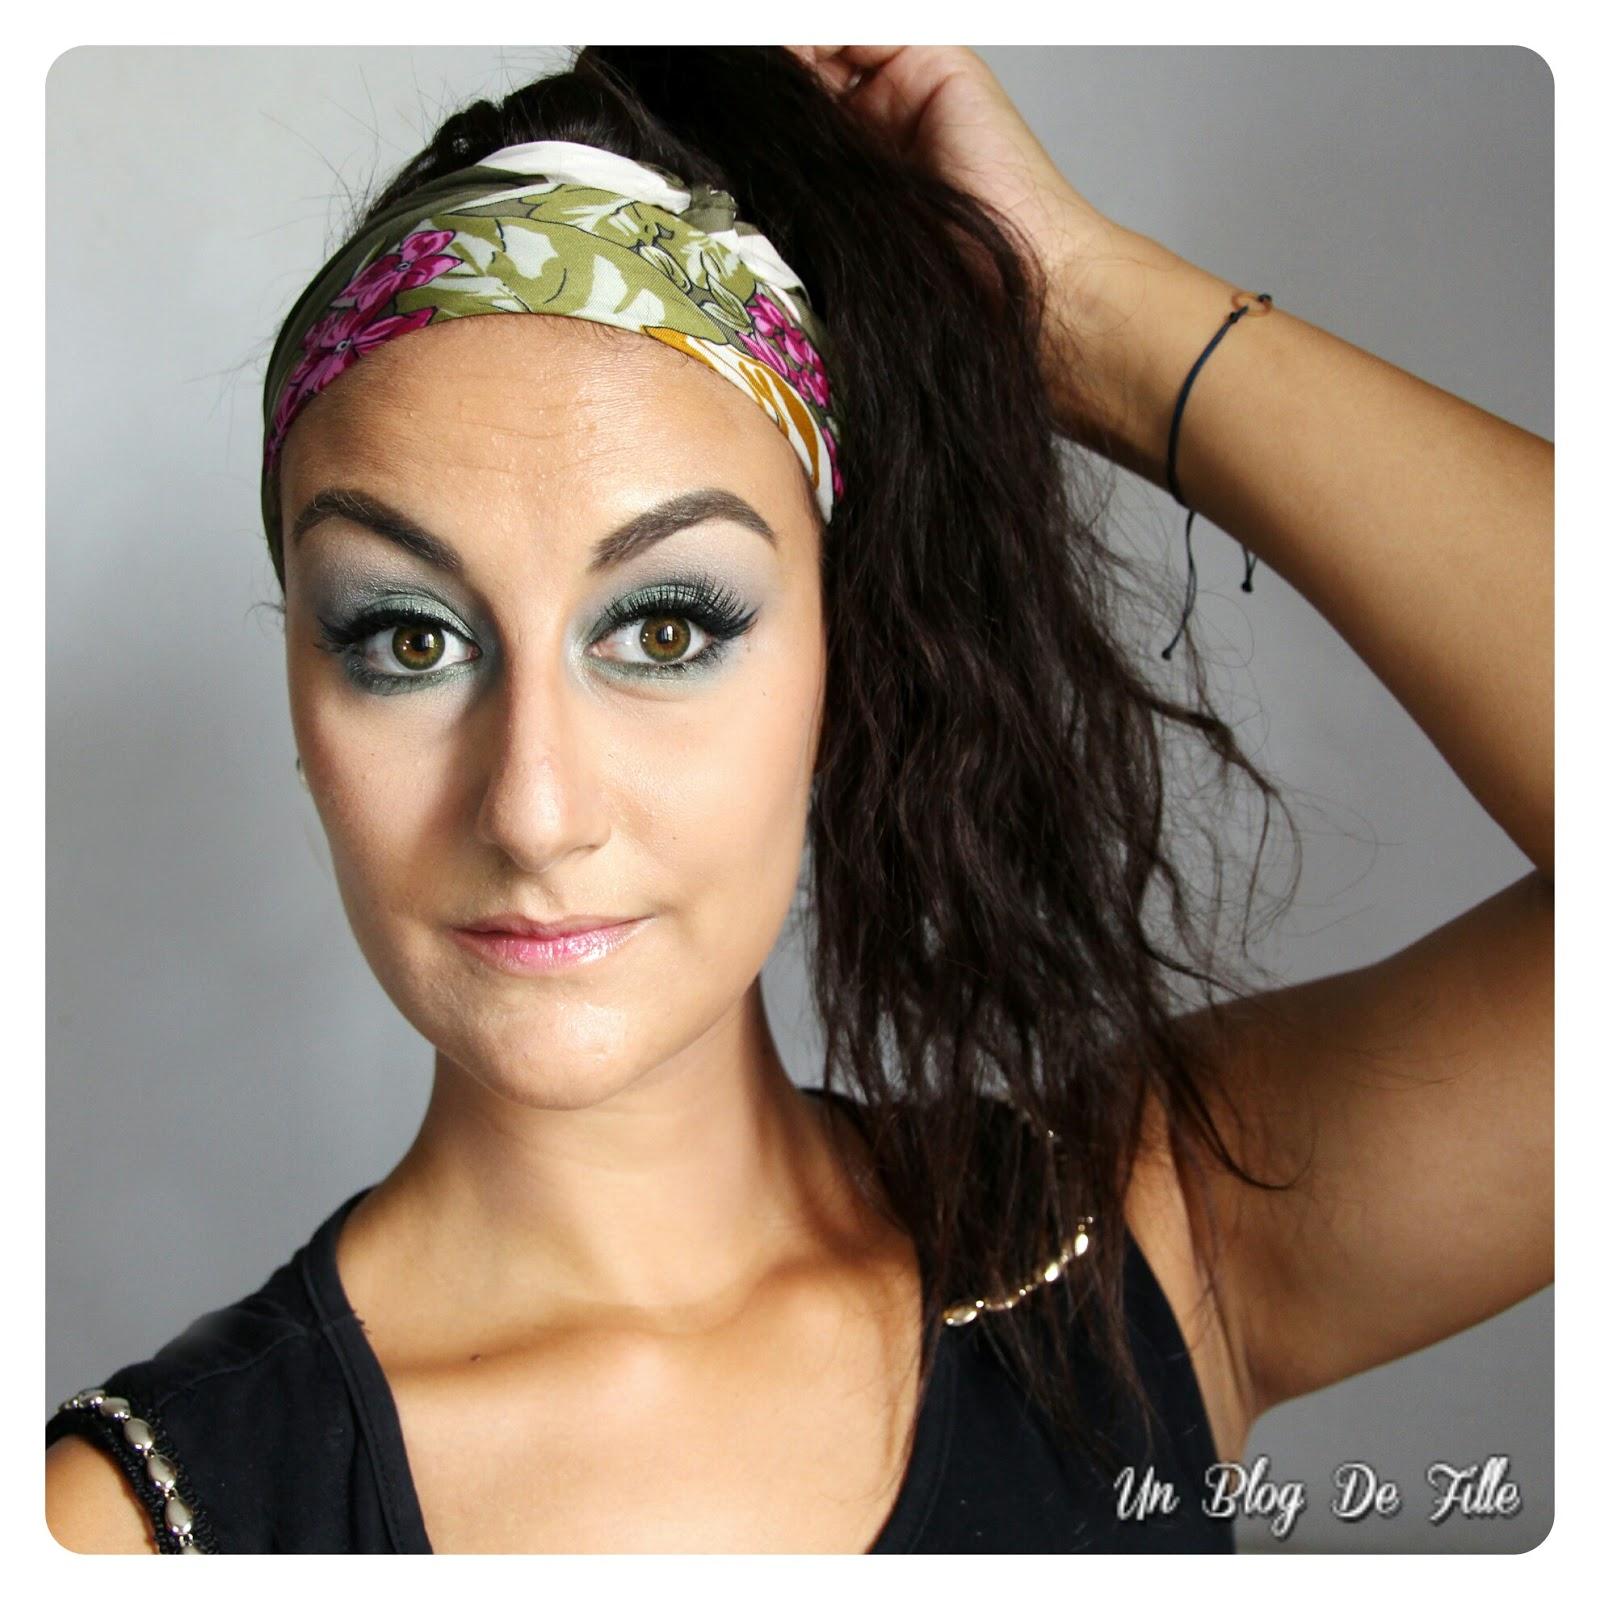 http://unblogdefille.blogspot.fr/2017/08/maquillage-vert-et-gris-msc.html